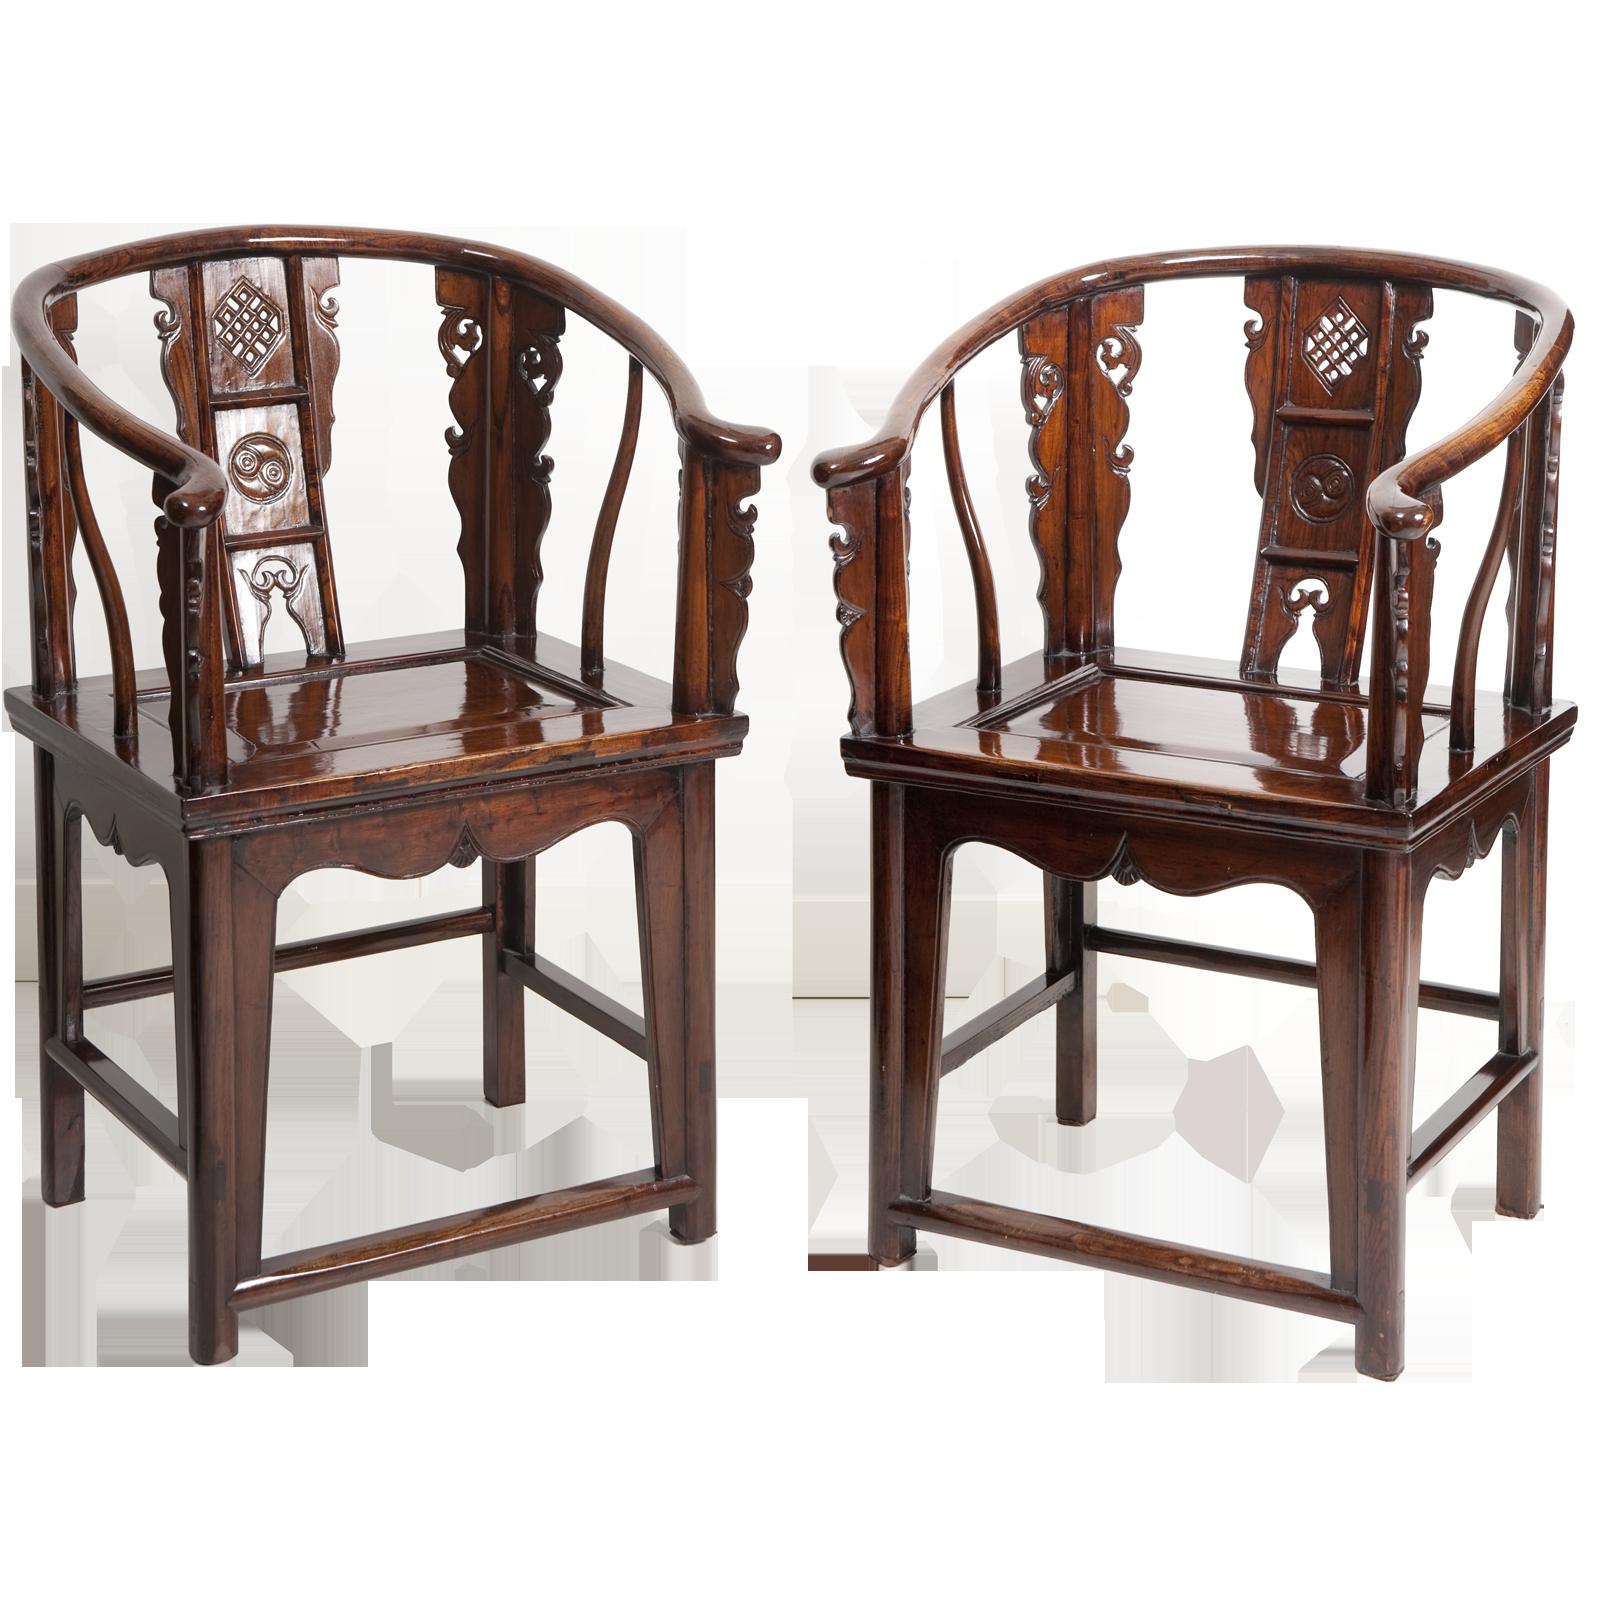 Muebles japoneses baratos obtenga ideas dise o de for Muebles japoneses antiguos